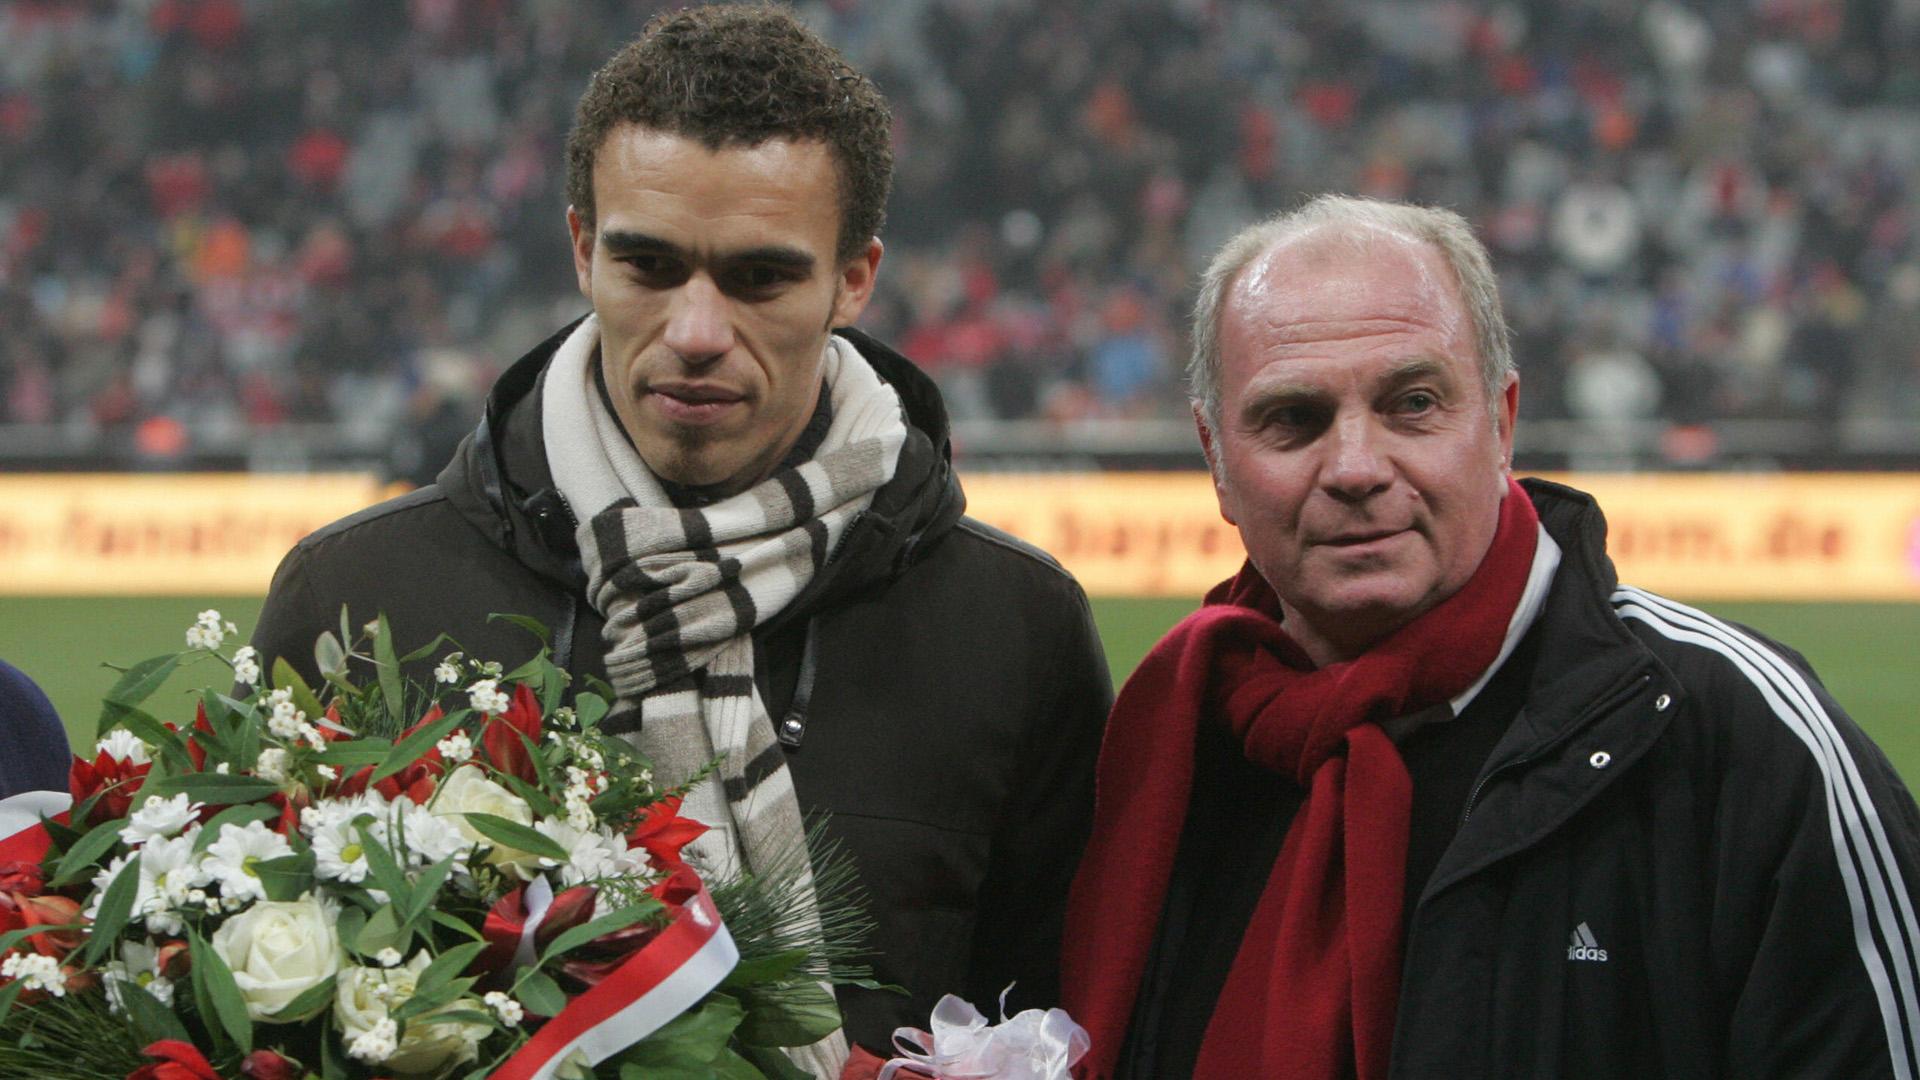 FC Bayern feiert auf USA-Reise Erfolg gegen Real Madrid